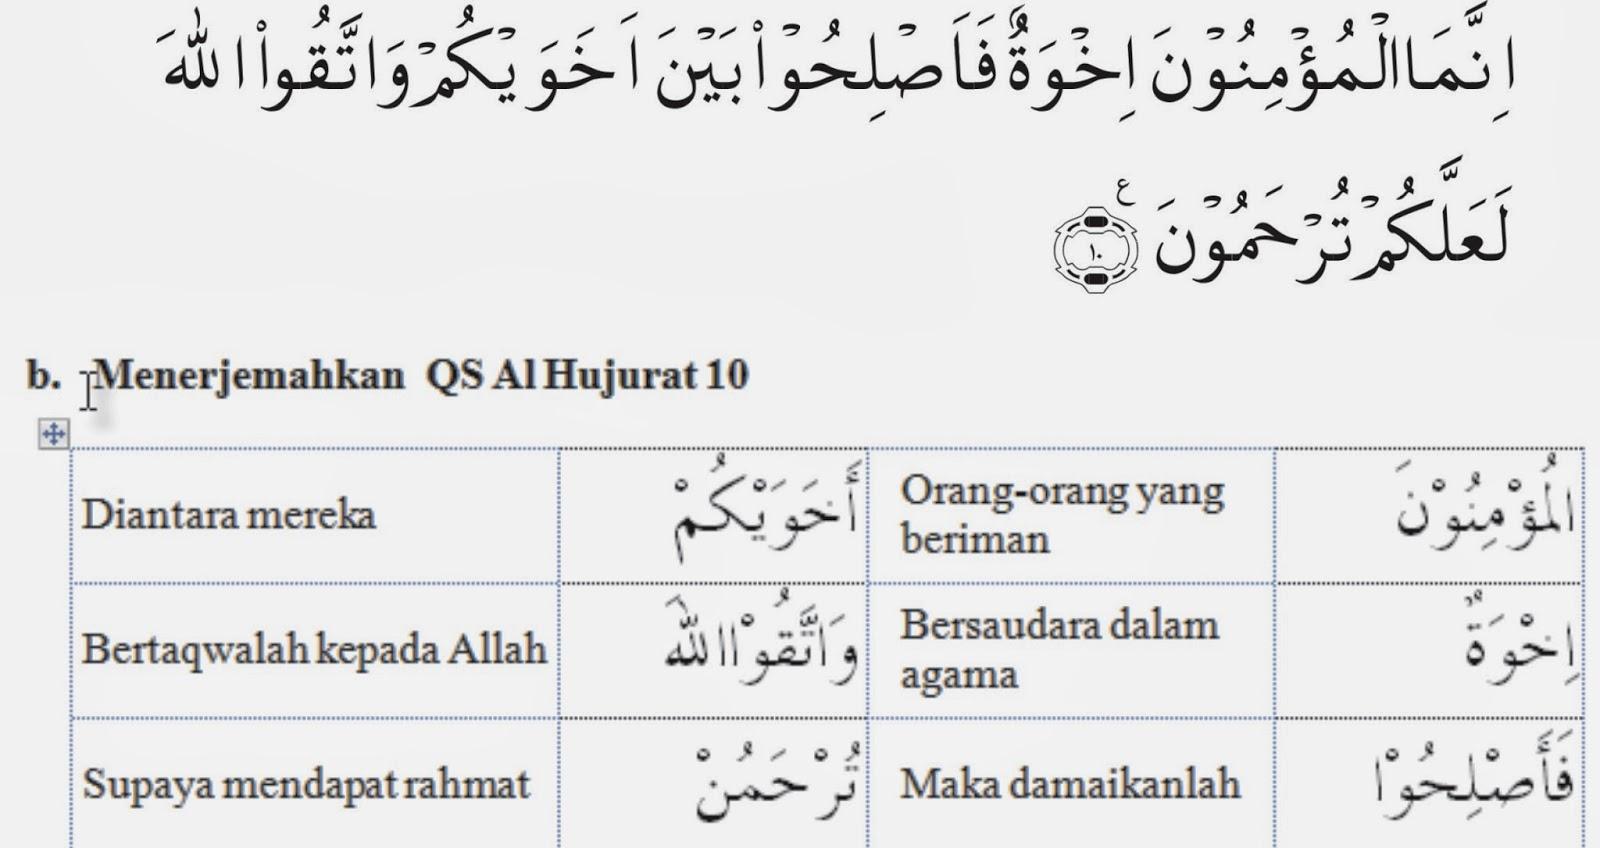 Citaten Quran Beserta Artinya : Mitrakerjasmk spot indahnya belajar al qur an